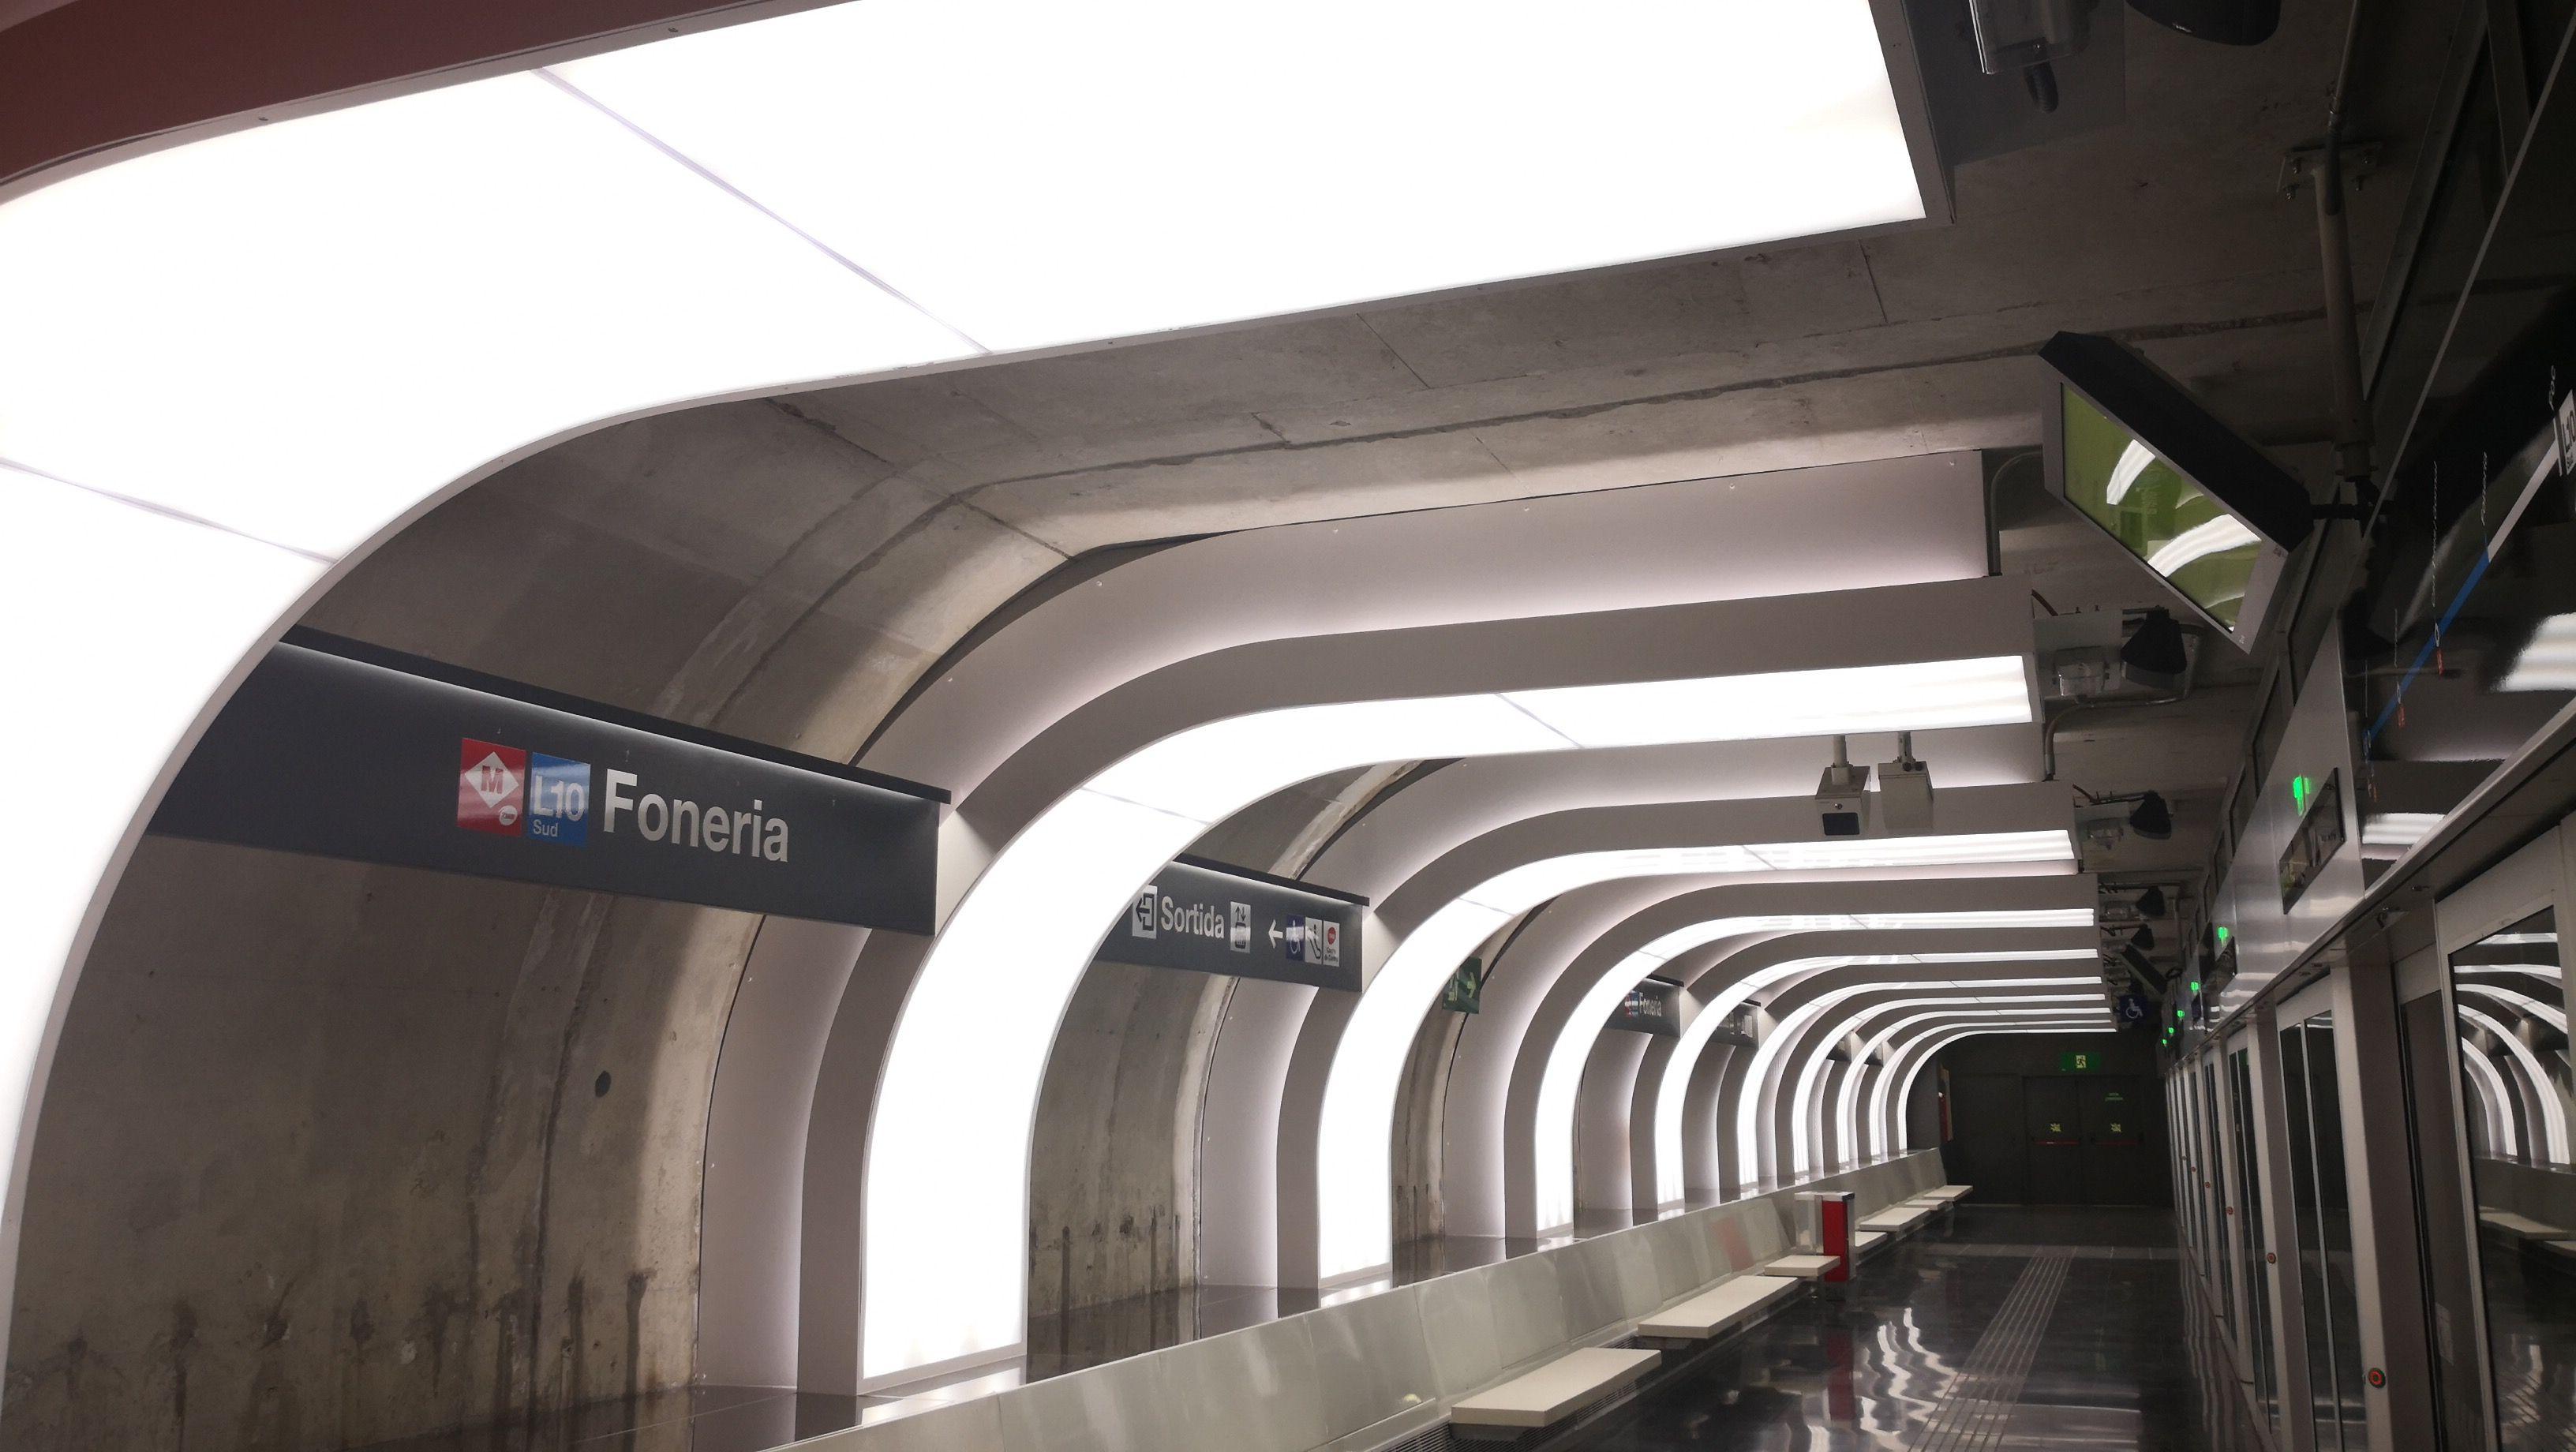 luminaria-geminy-luxes-estacion-metro-foneria-barcelona